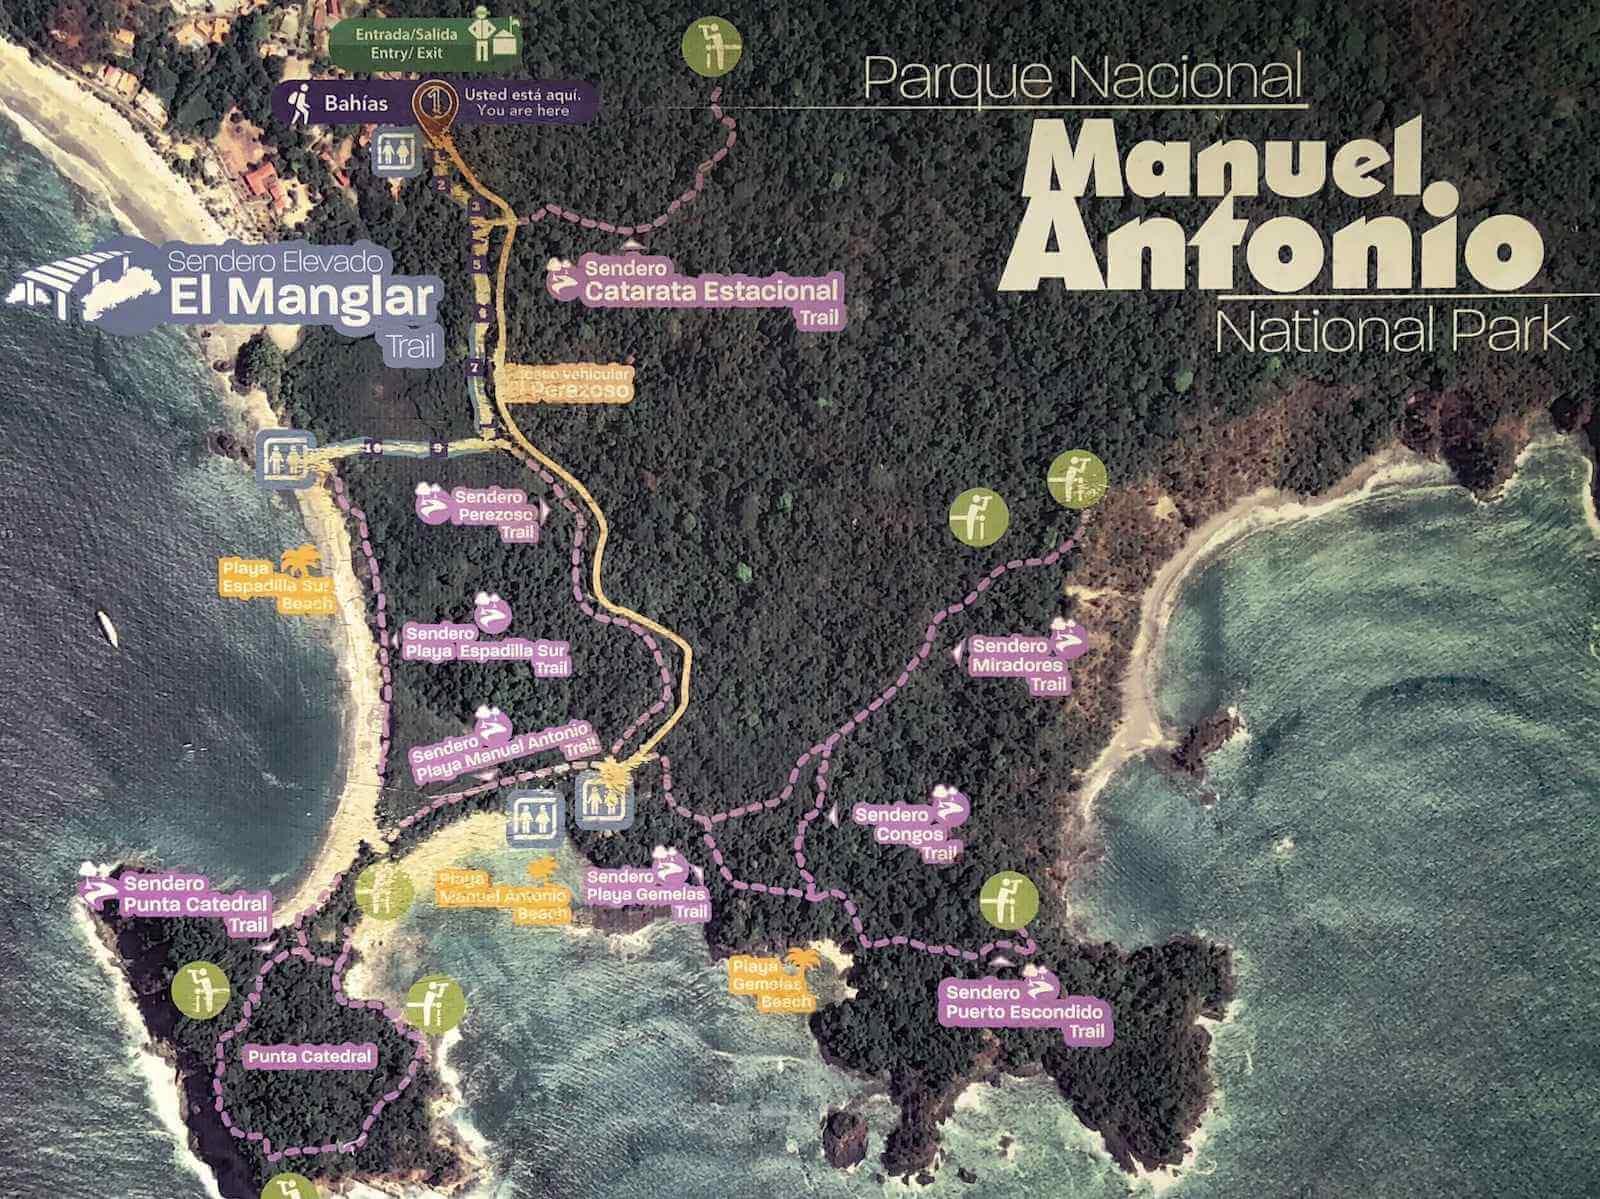 Manuel Antonio National Park wandelroutes